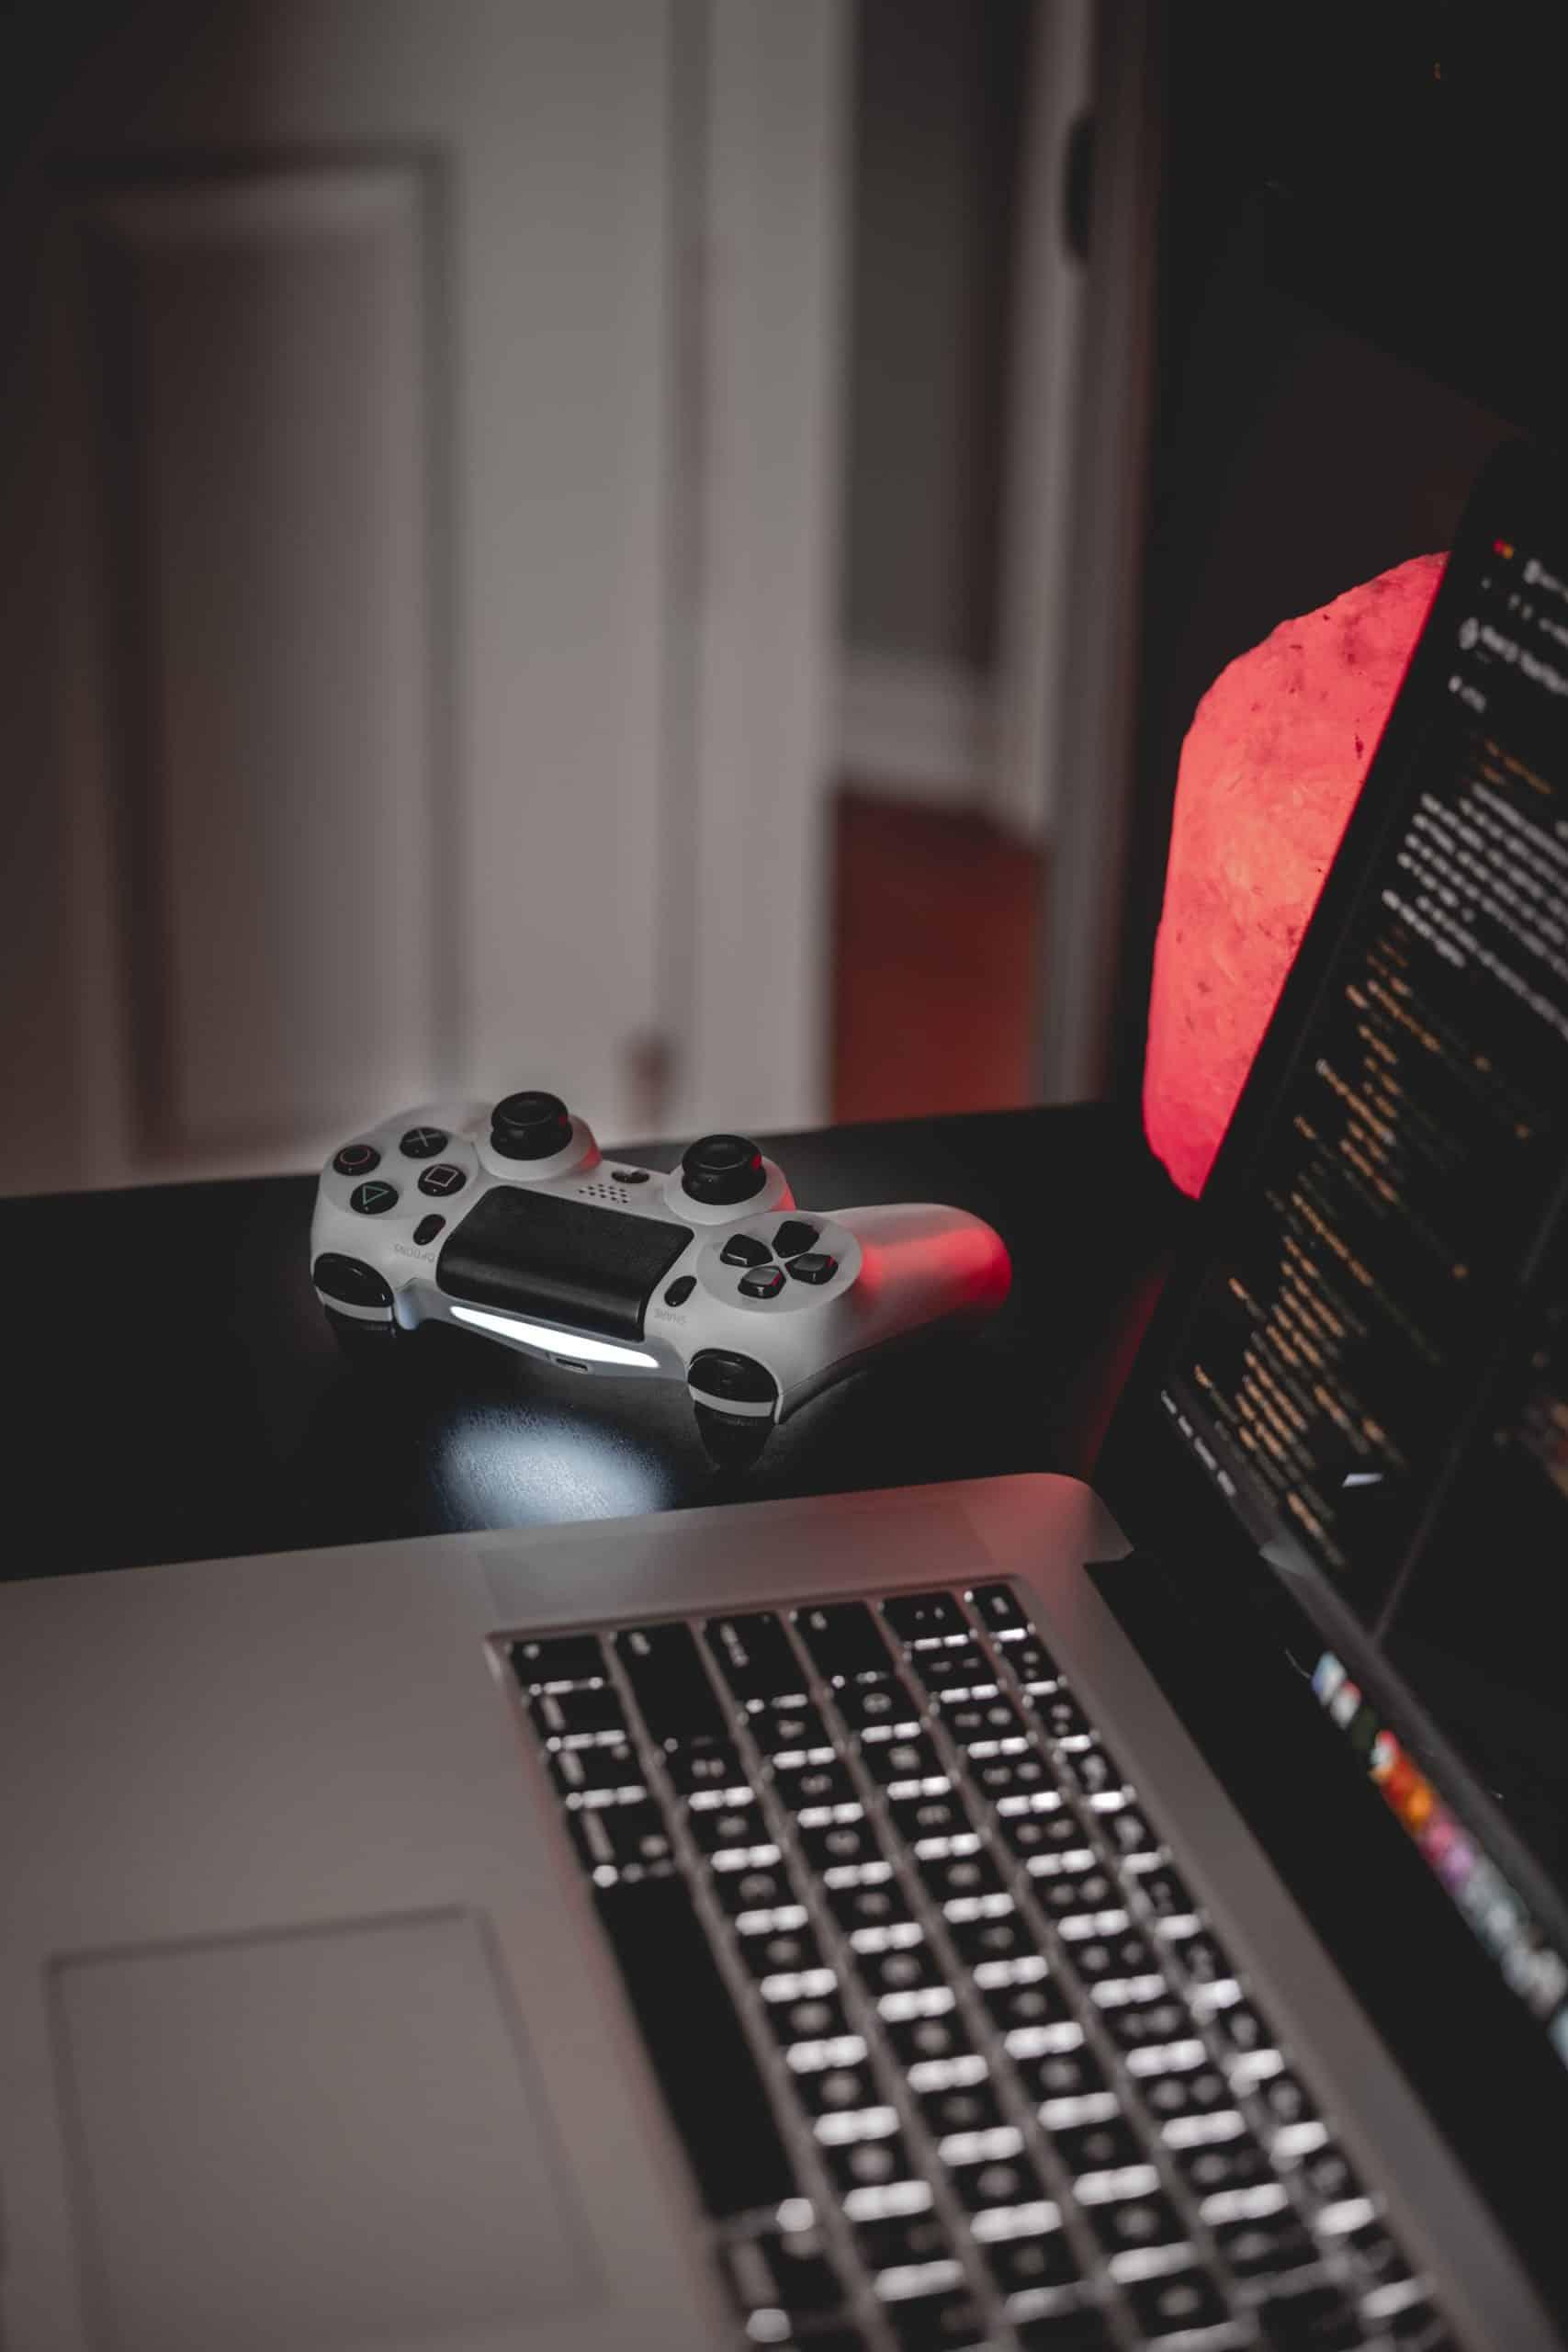 12 Factors Buying Laptop Article Image